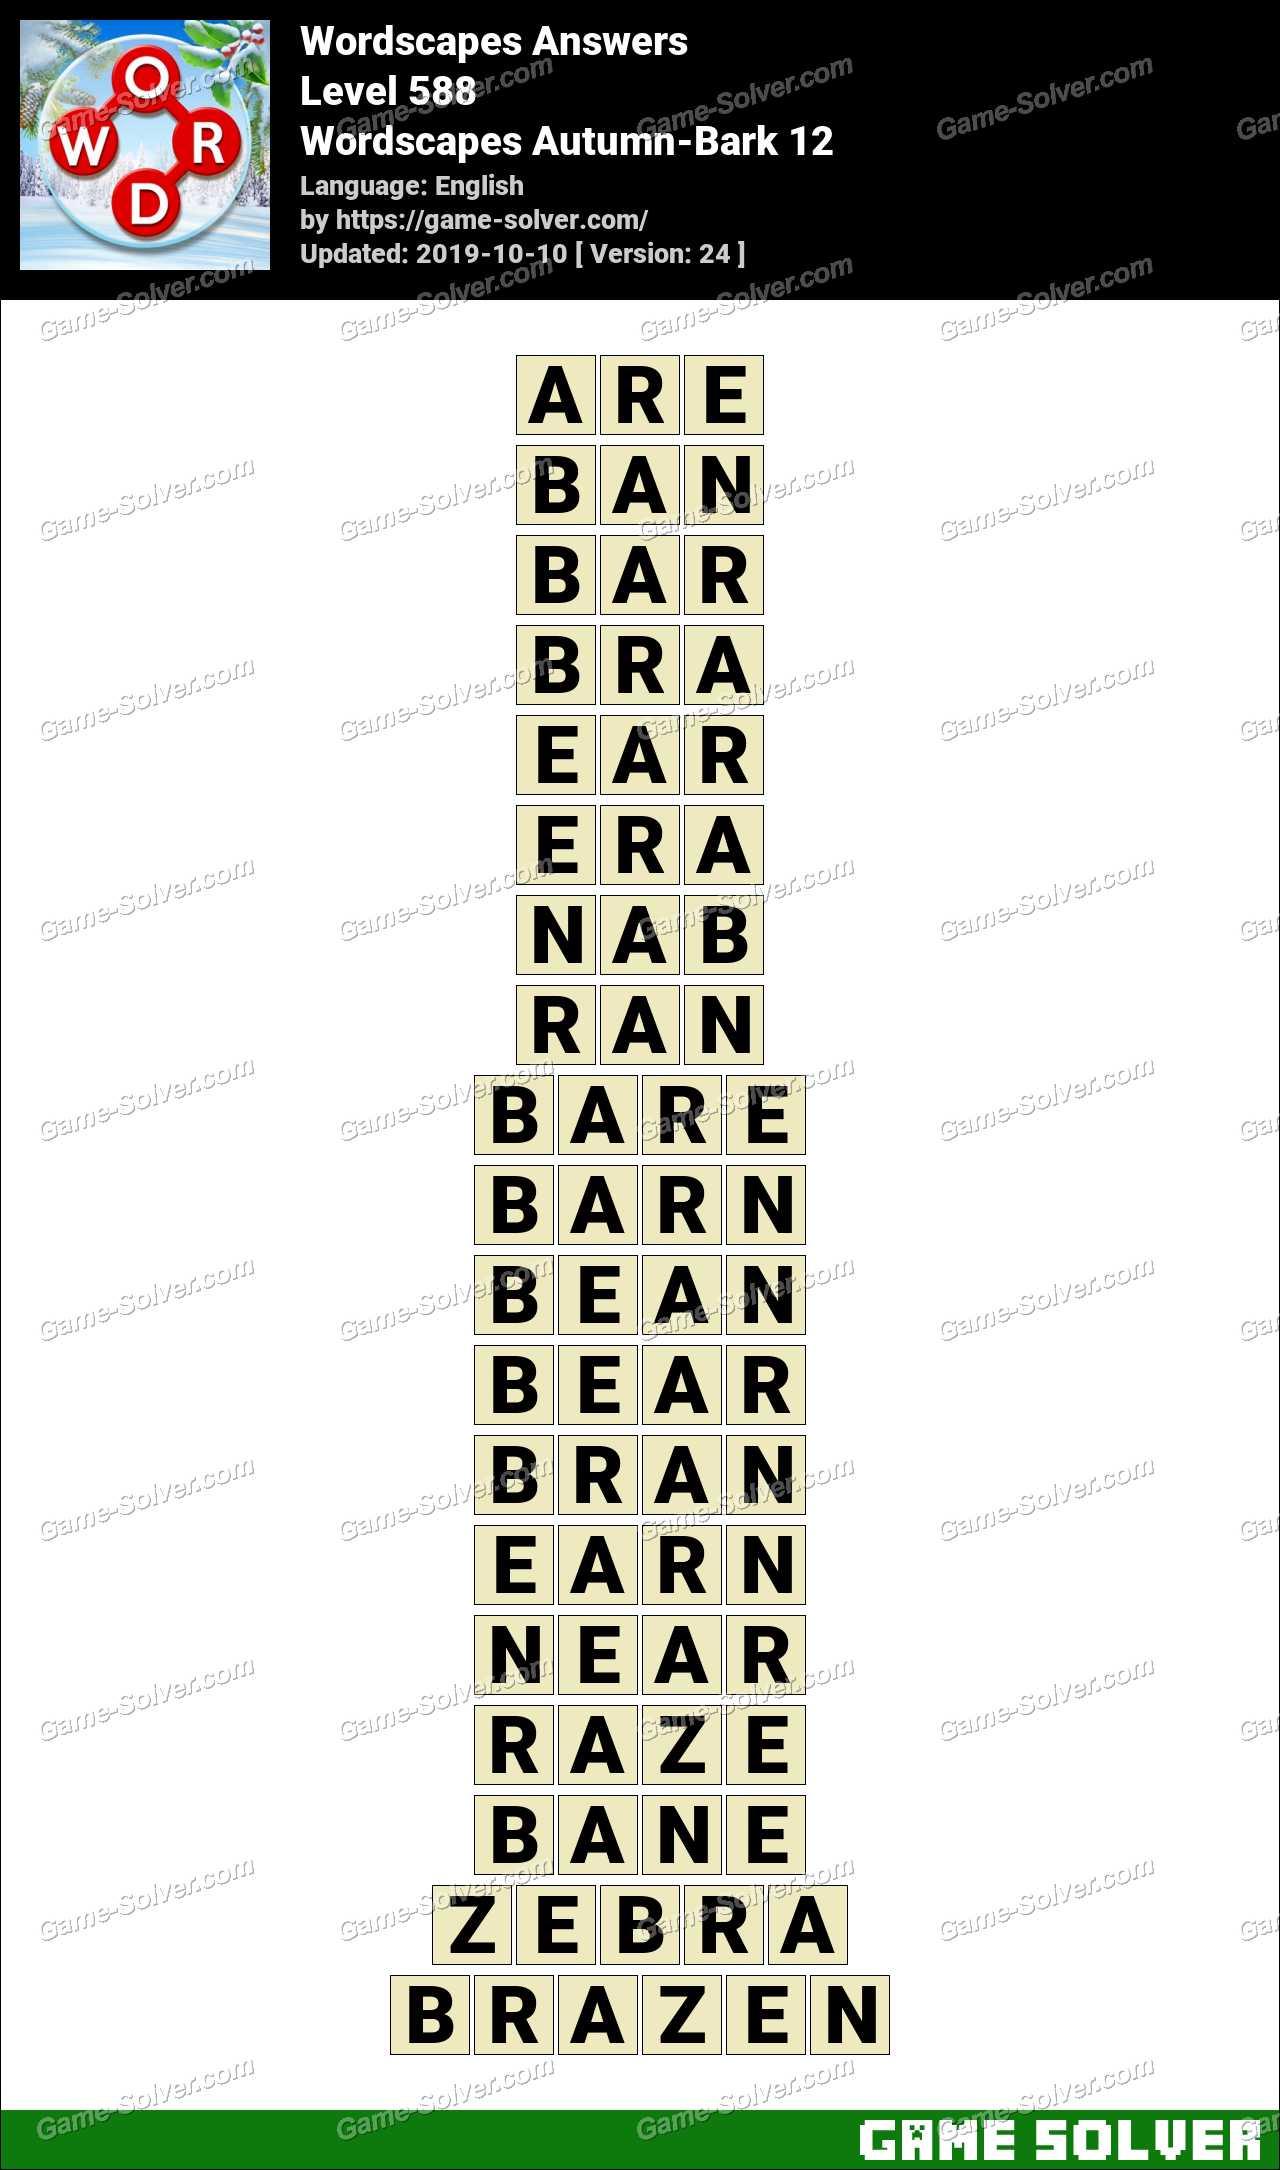 Wordscapes Autumn-Bark 12 Answers